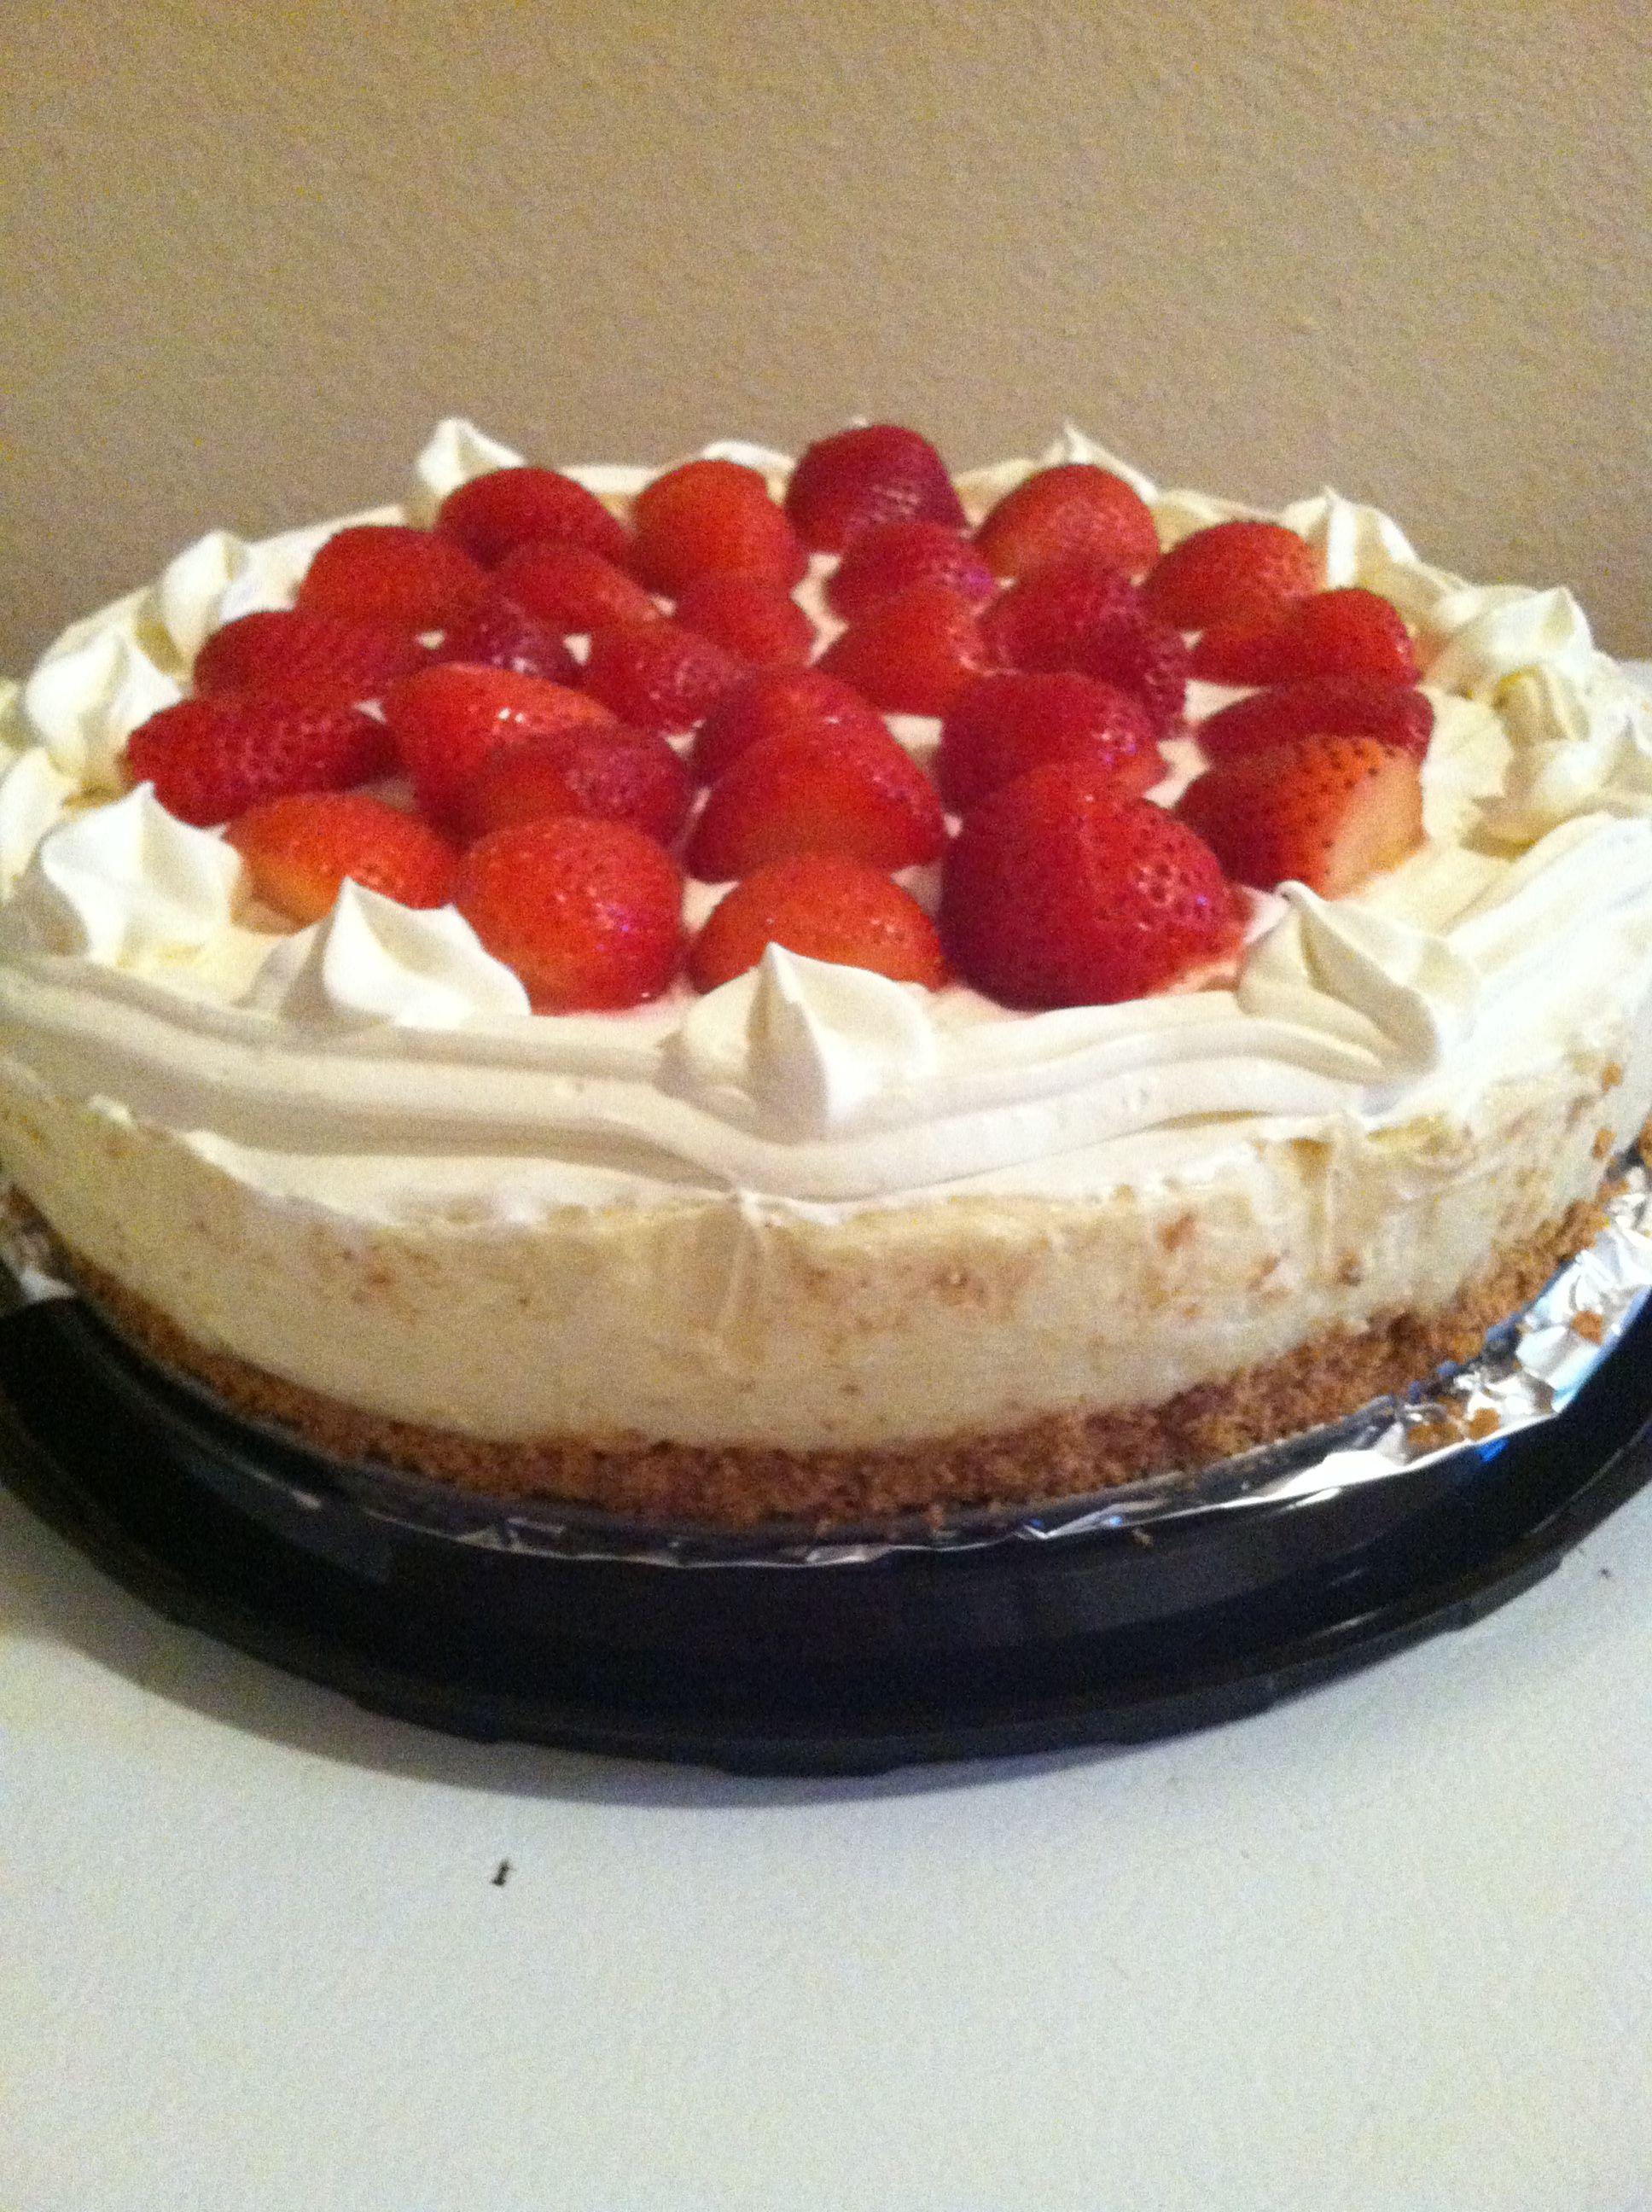 homemade strawberry cheesecake Cheesecake specials Pinterest